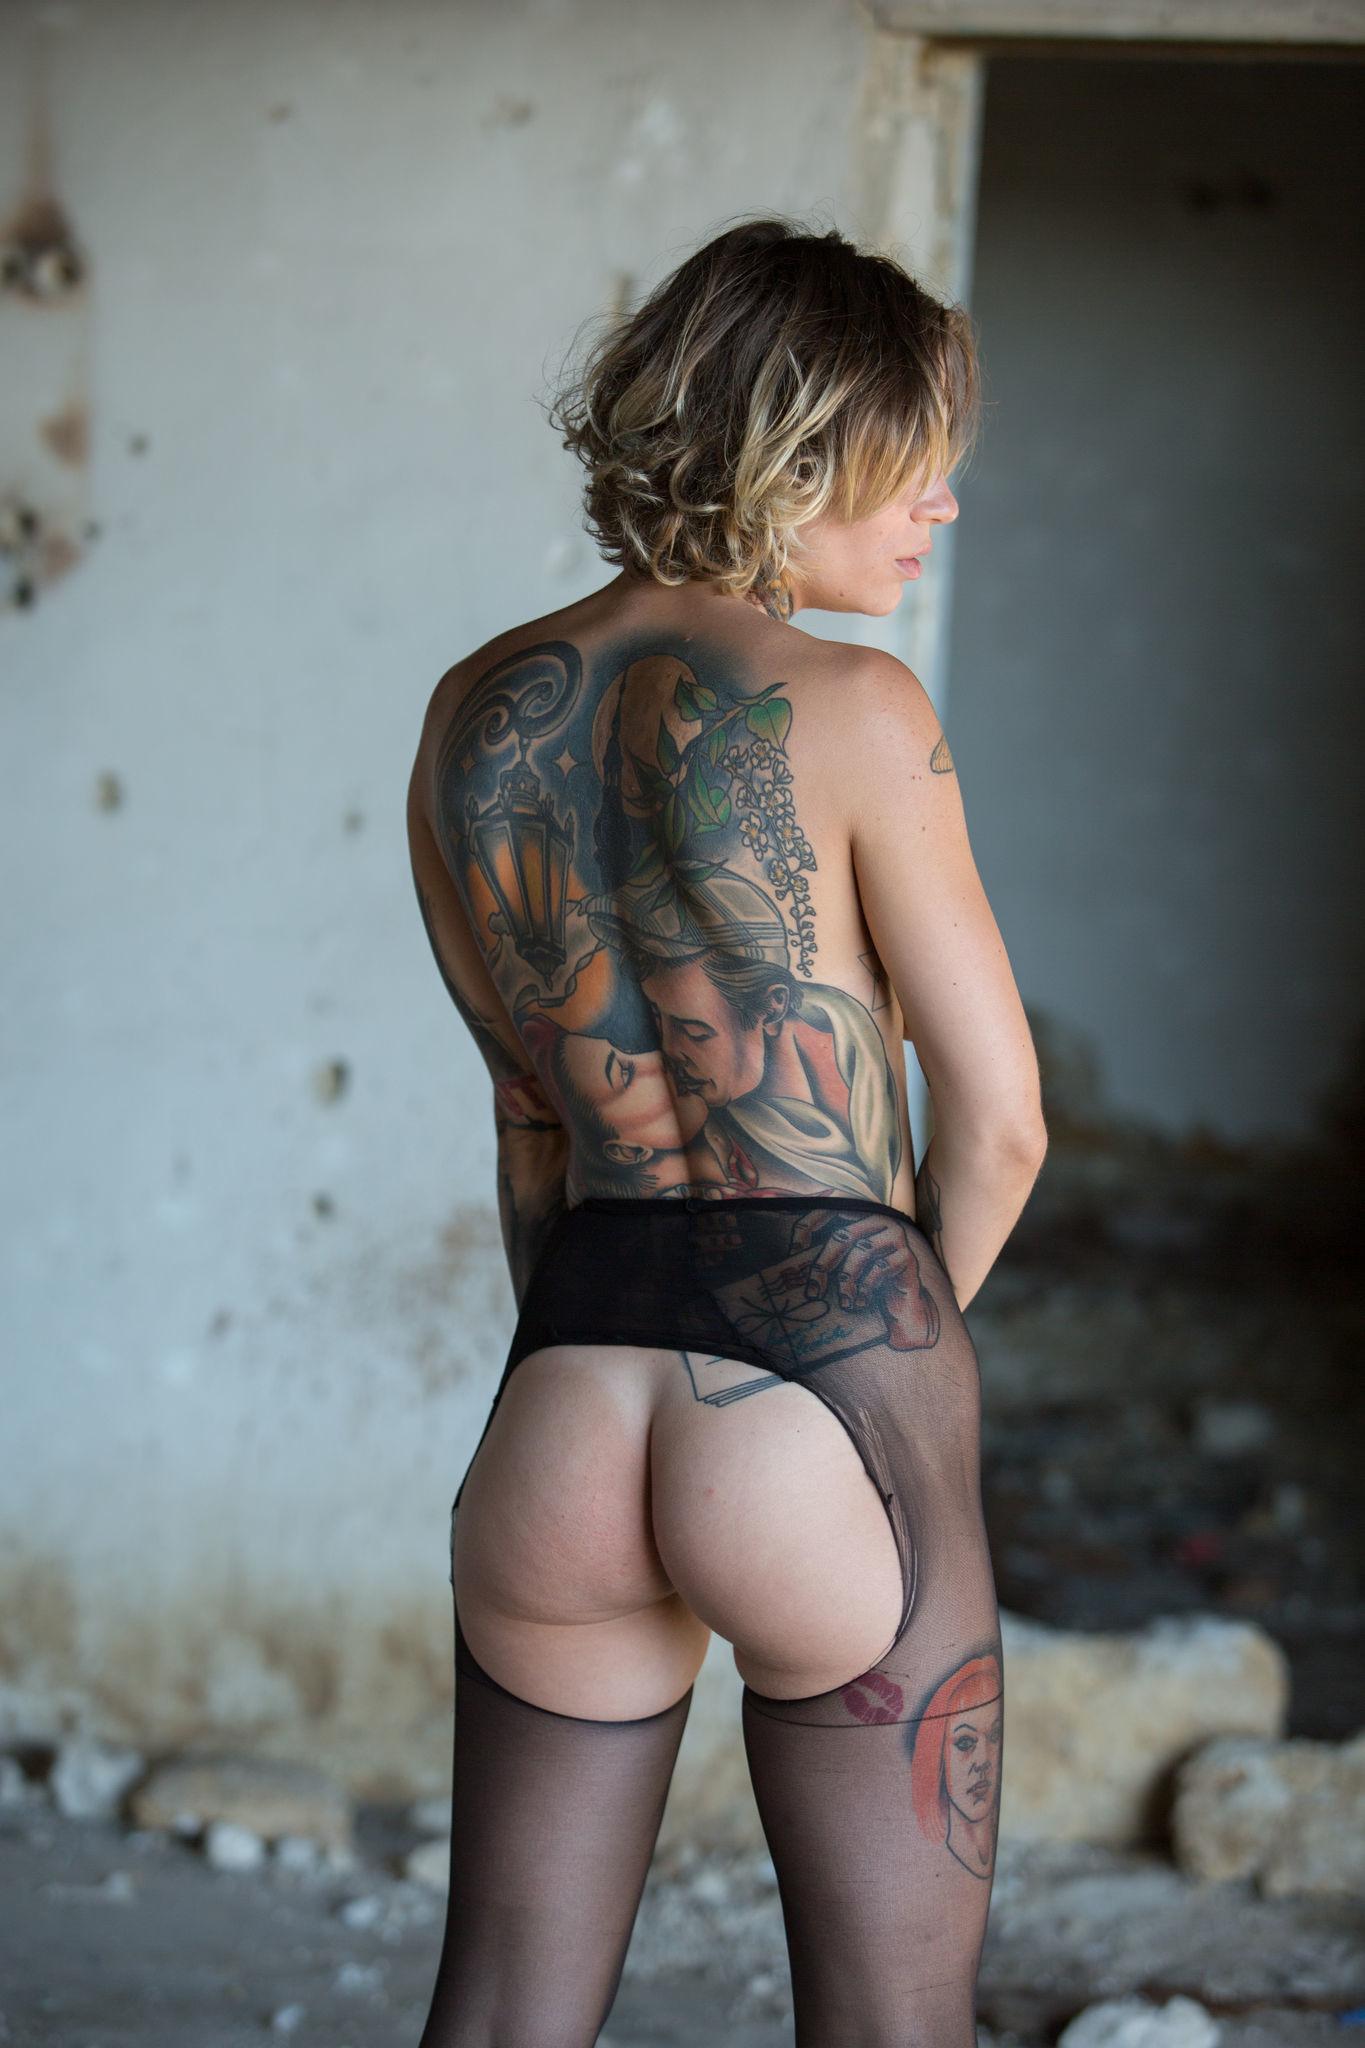 Actor Porno Gay Brasileño Cara Tatuada stacy cloud showing nude tattoo body in loneliness setting